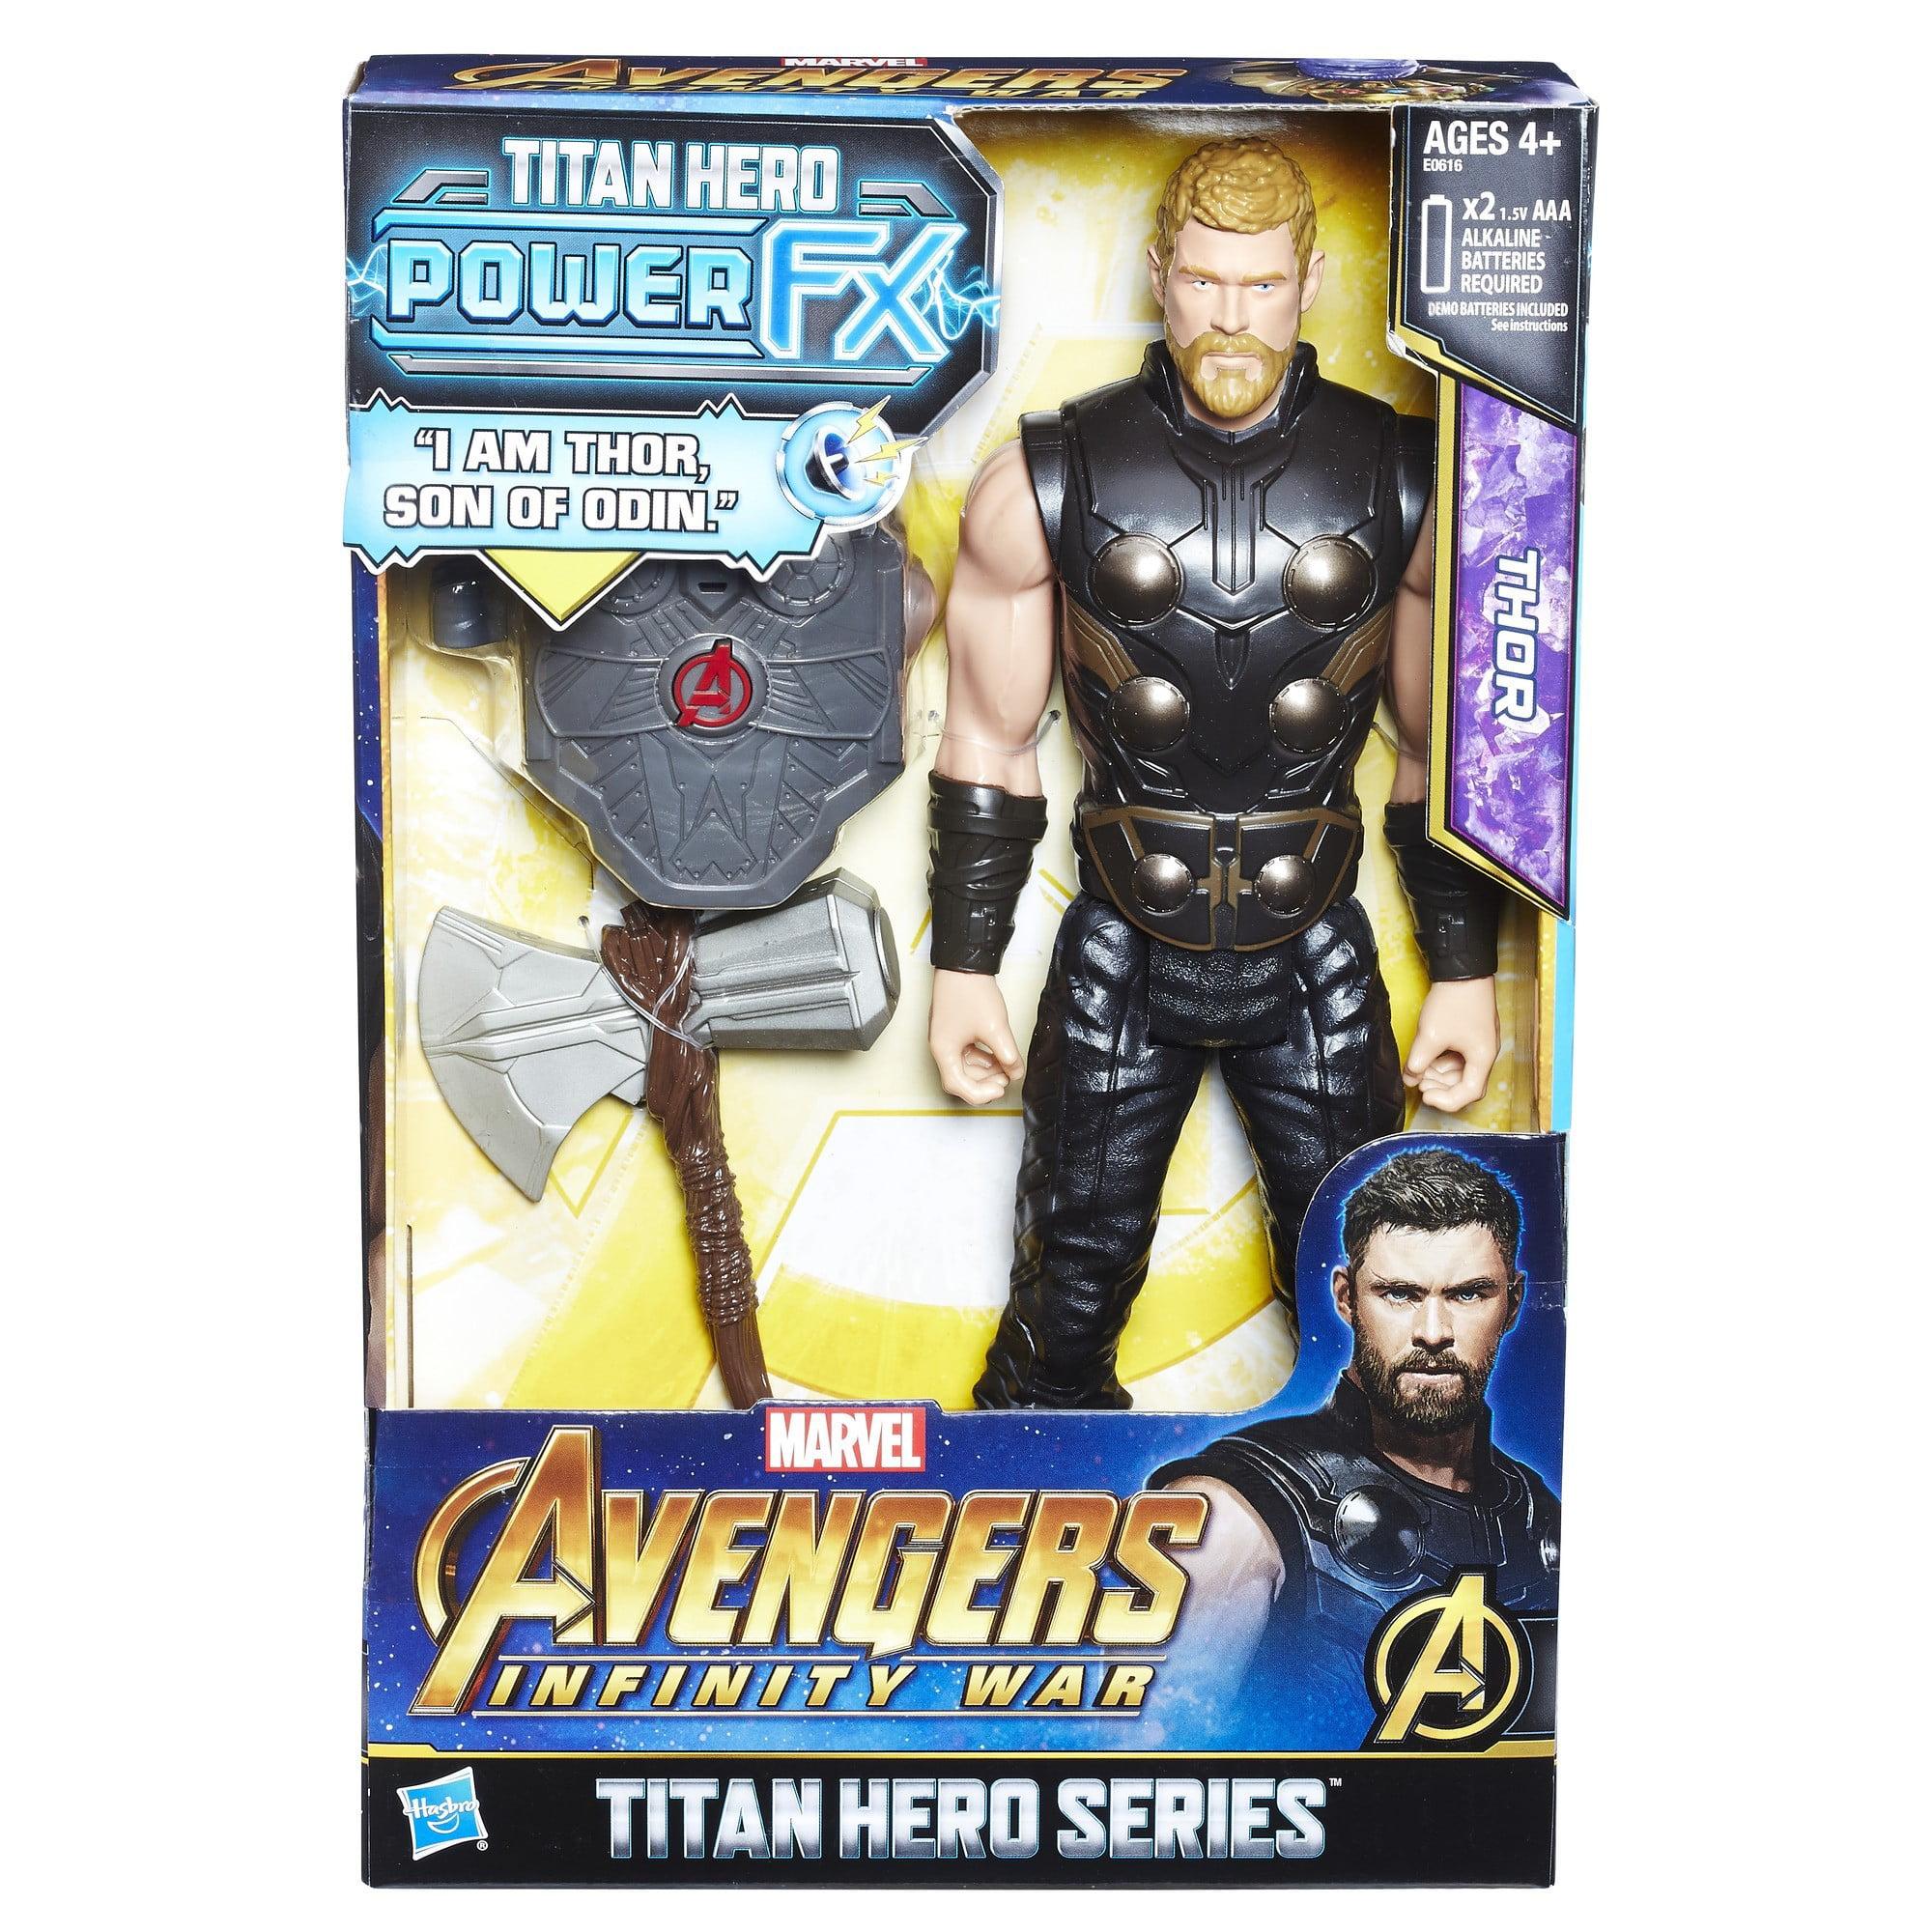 Marvel Avengers Infinity War Thor Titan Hero Series 12-Inch Action Figure New